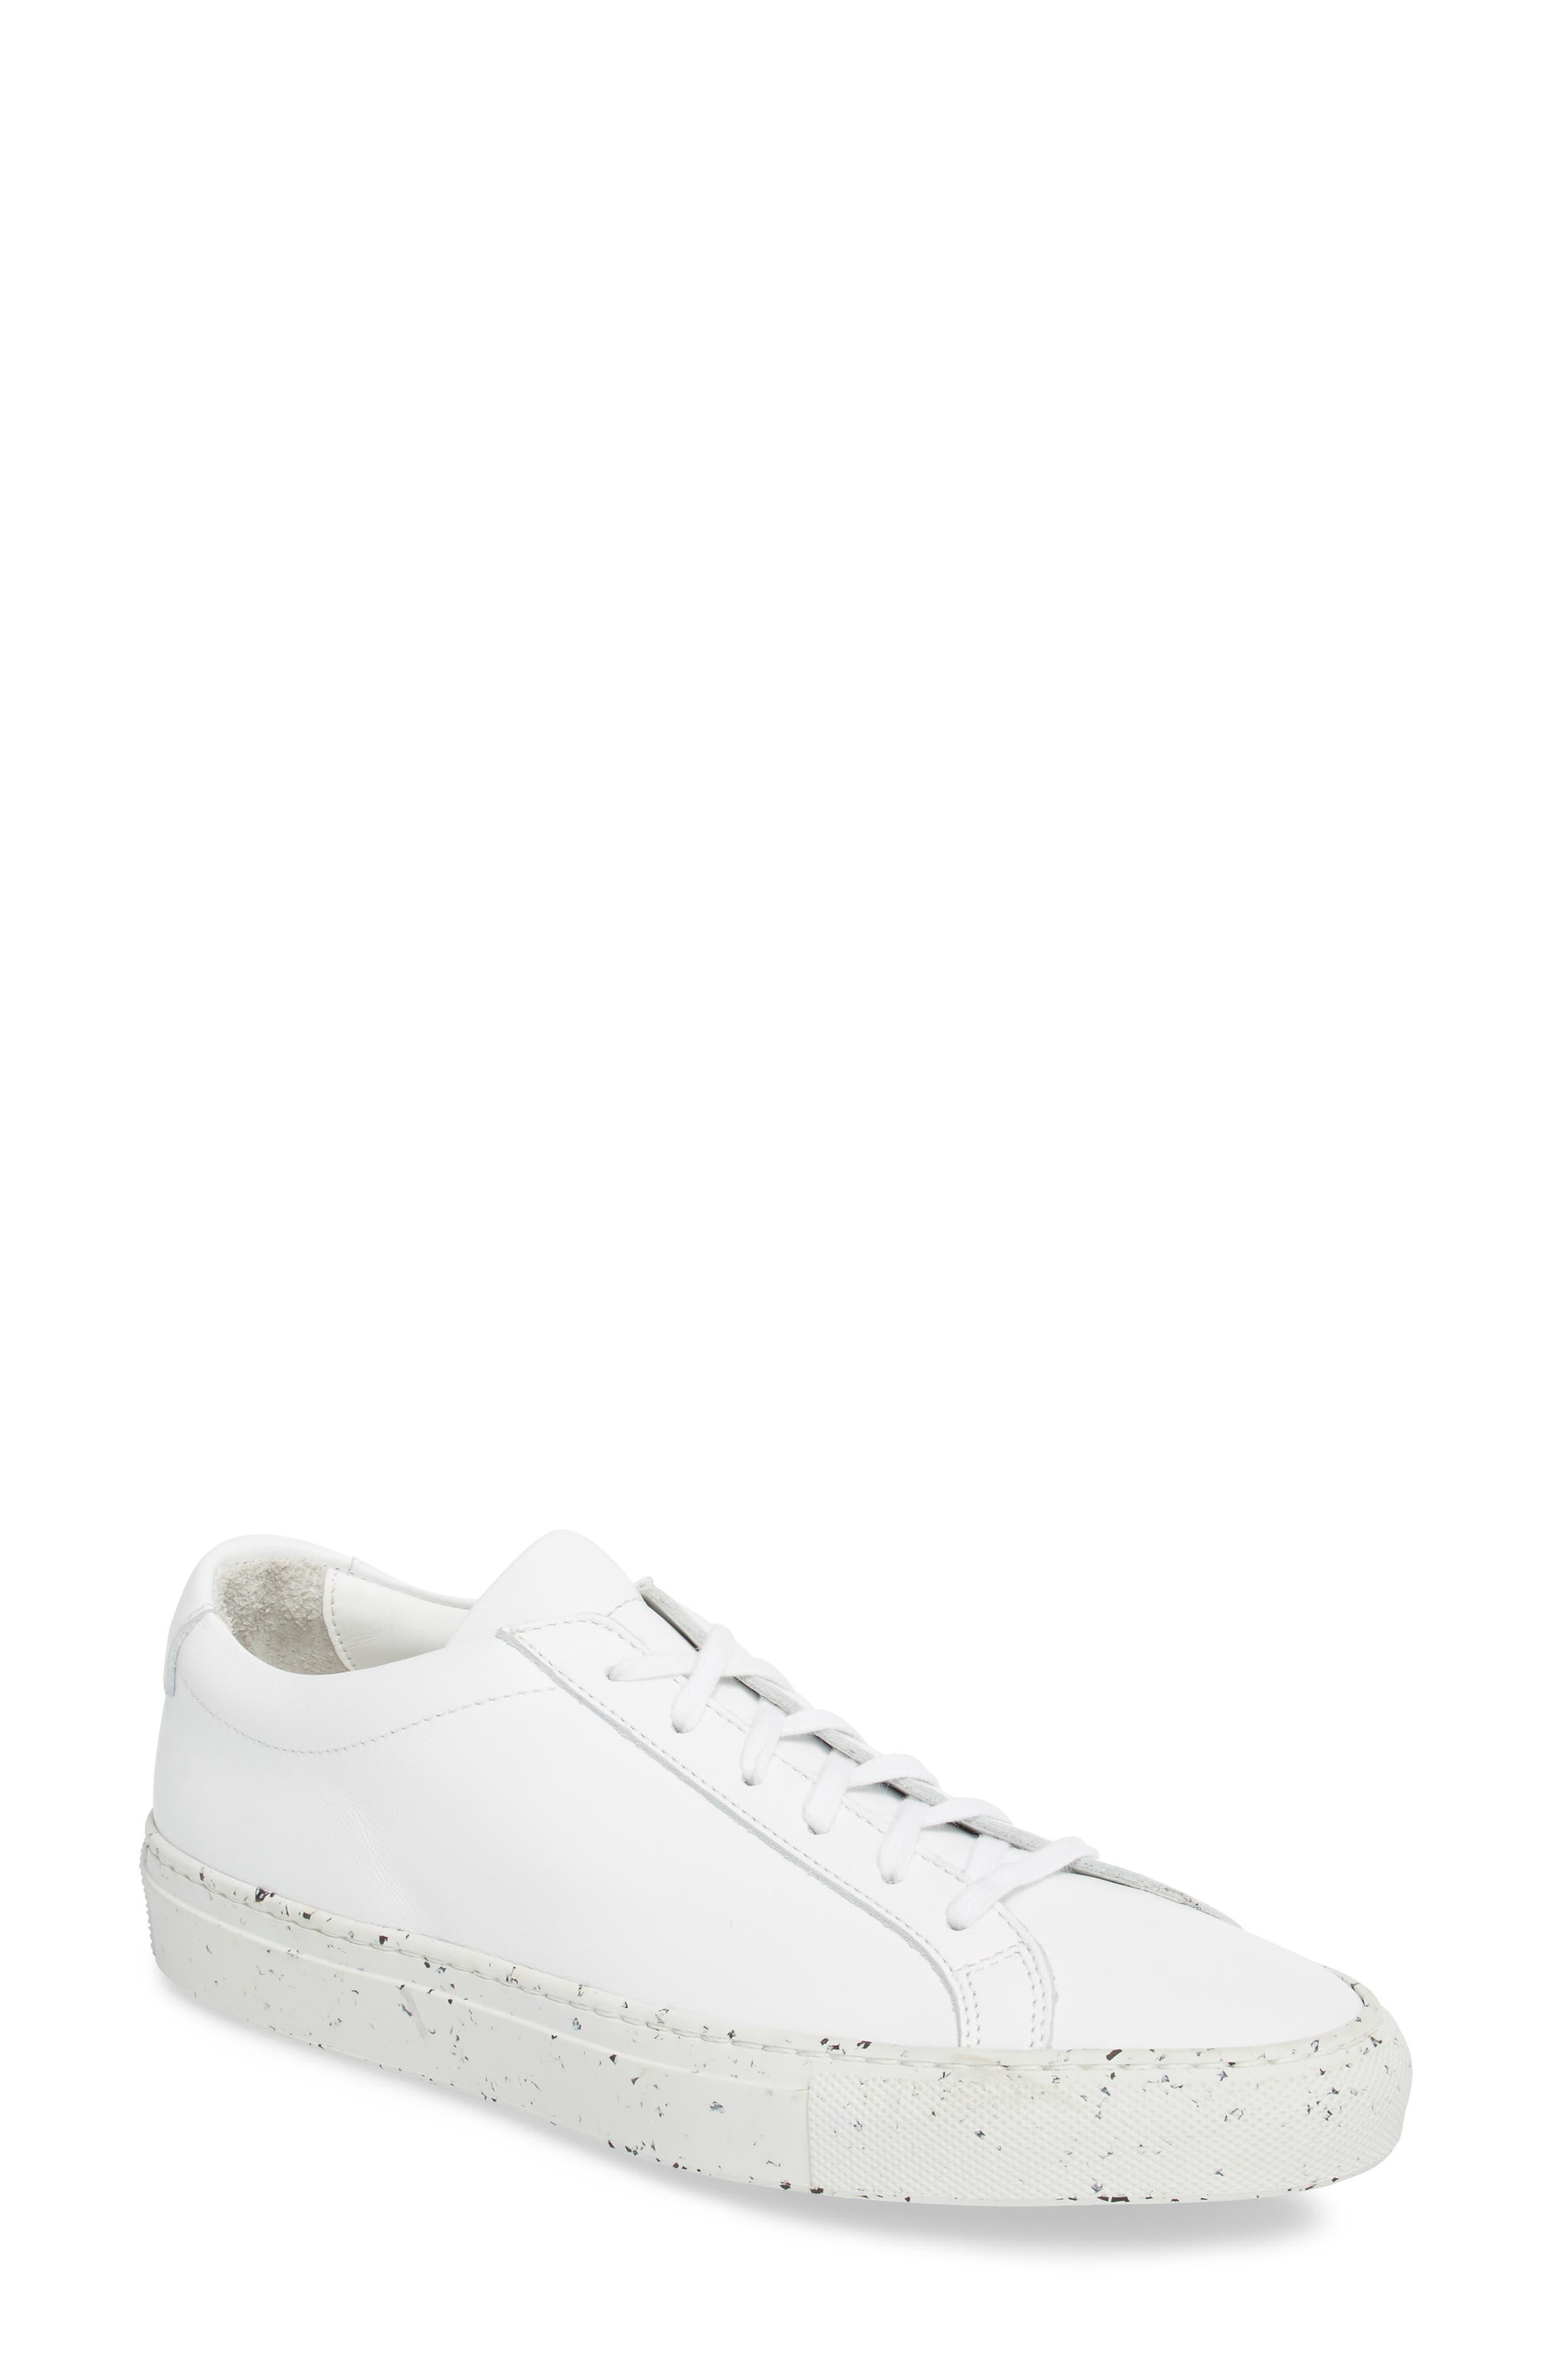 Common Projects Achilles Low Confetti Sole Sneaker (Women)